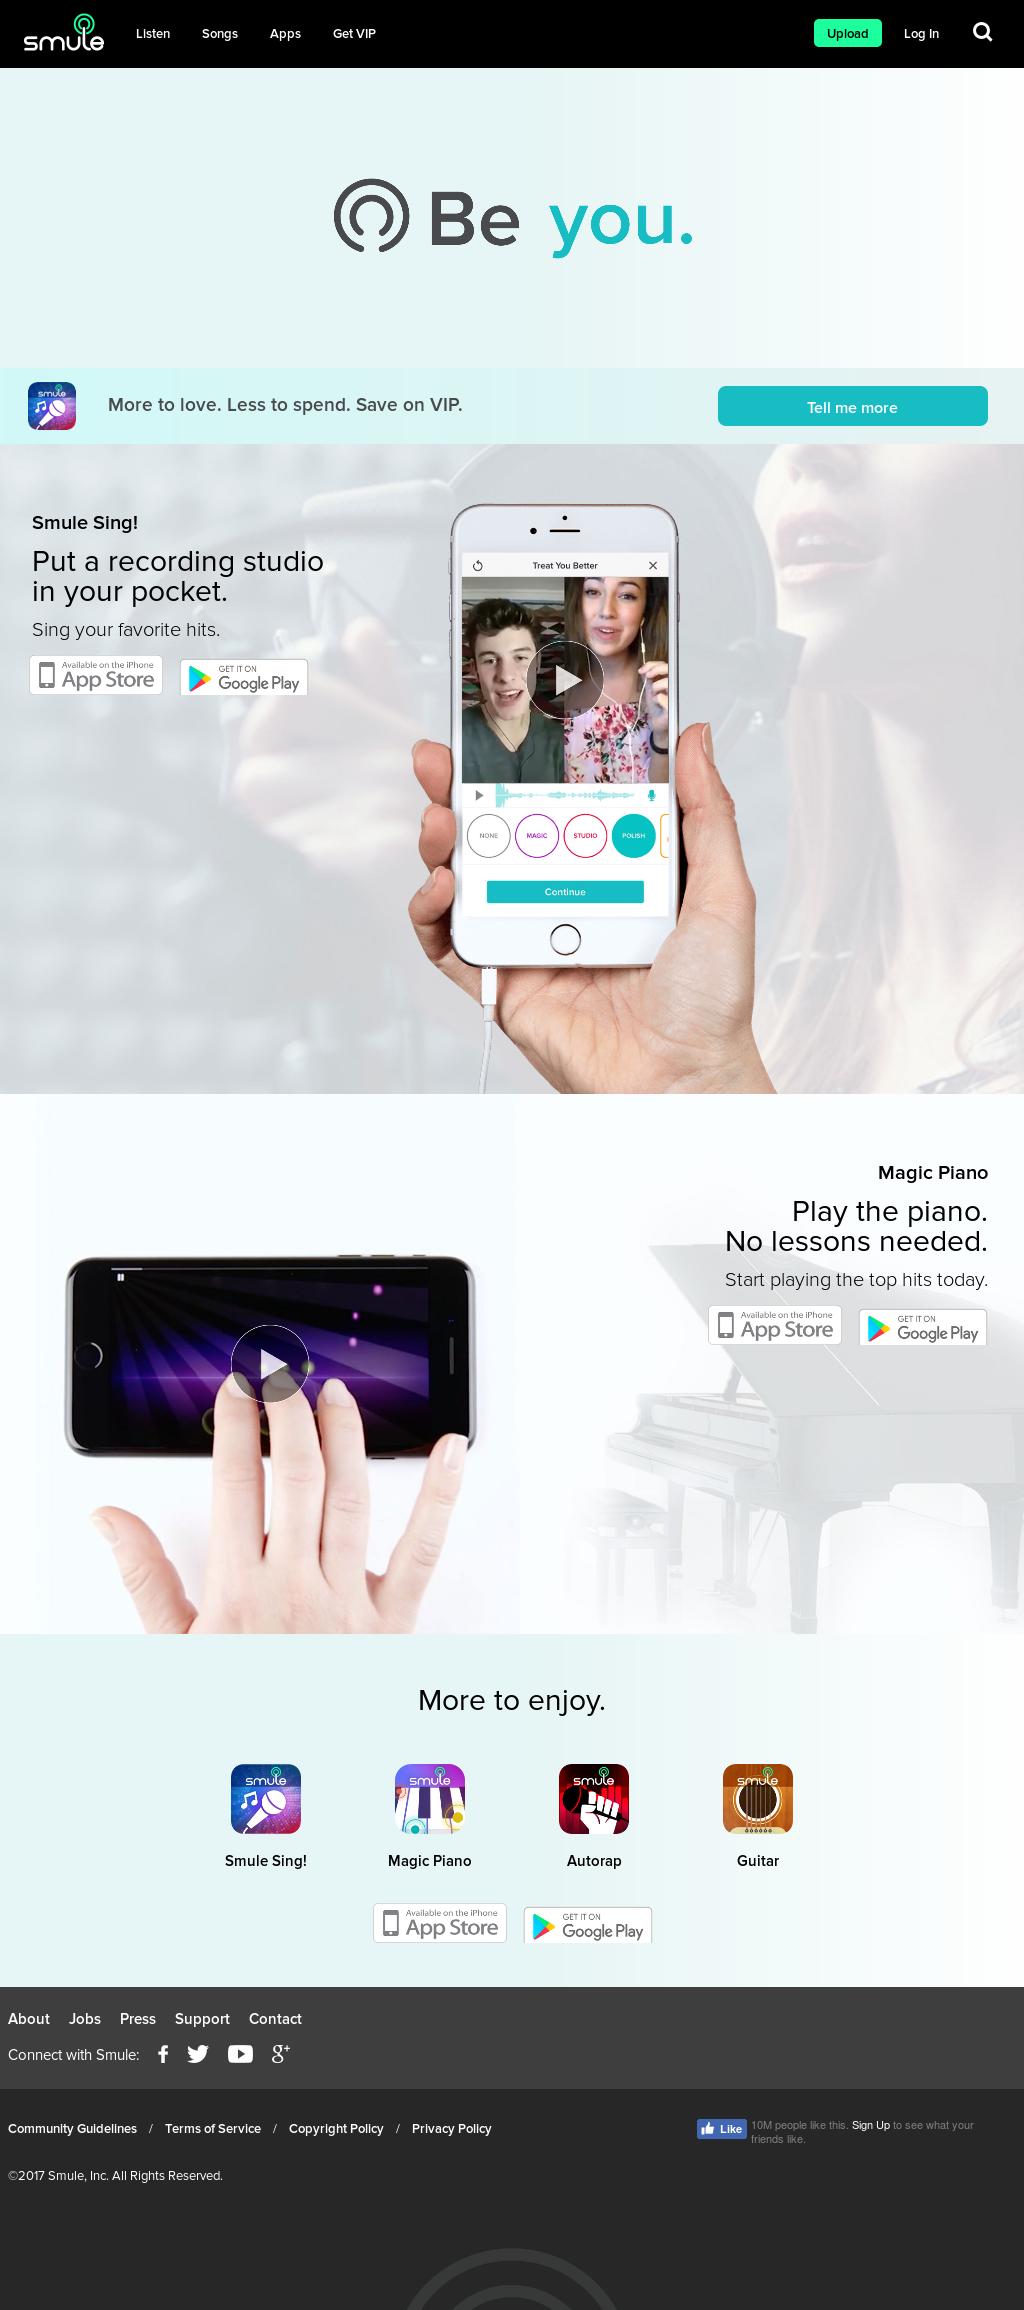 Owler Reports - Smule: Smule rebrands its Sing! Karaoke app